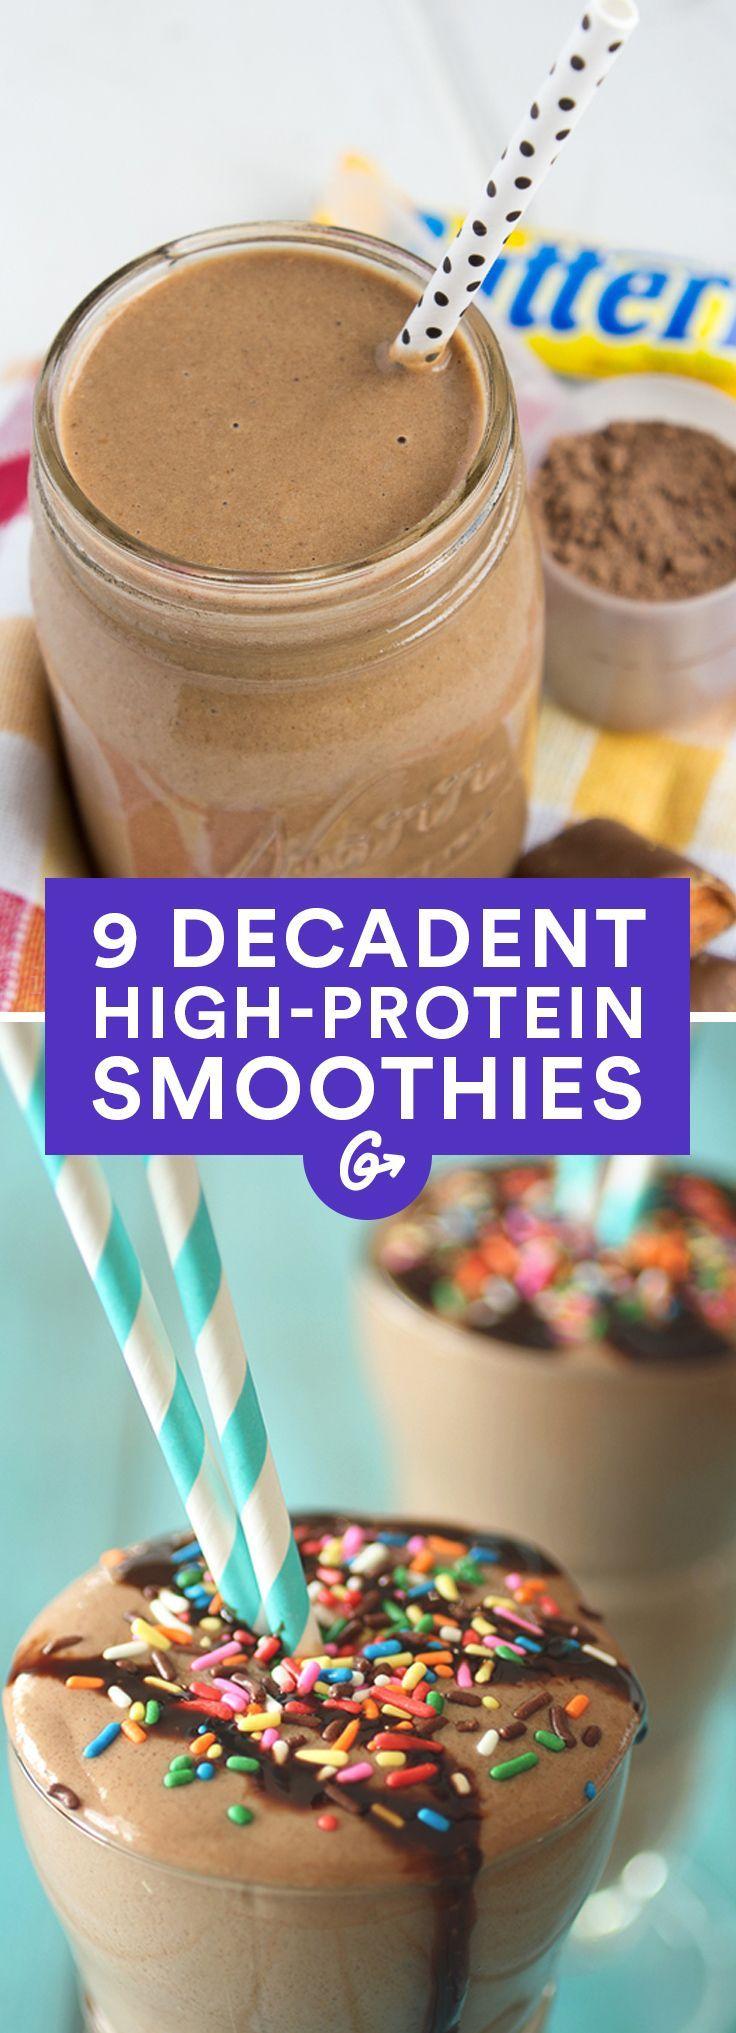 Best 25+ Oreo milkshake recipes ideas on Pinterest | Milk shakes, Milkshakes and Easy milkshake ...